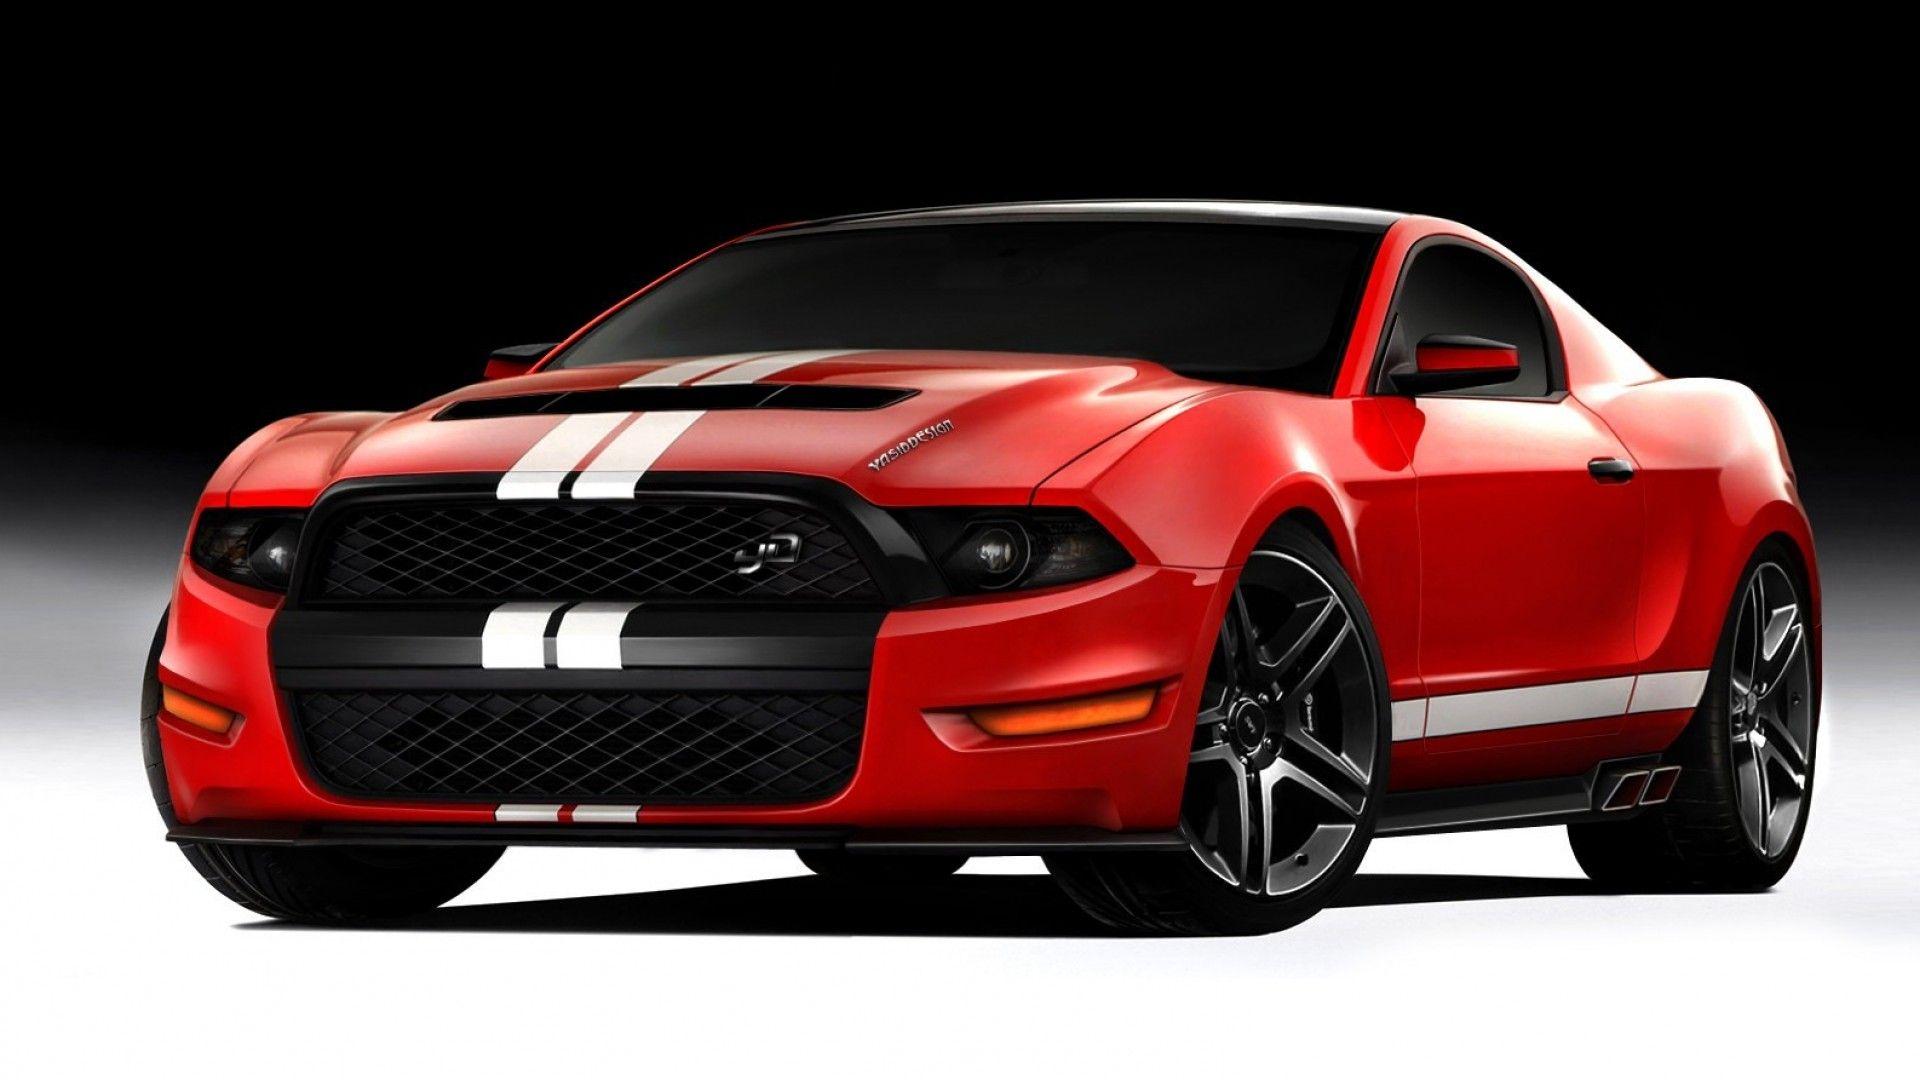 2014 Ford Mustang GT Premium is hd wallpaper for desktop